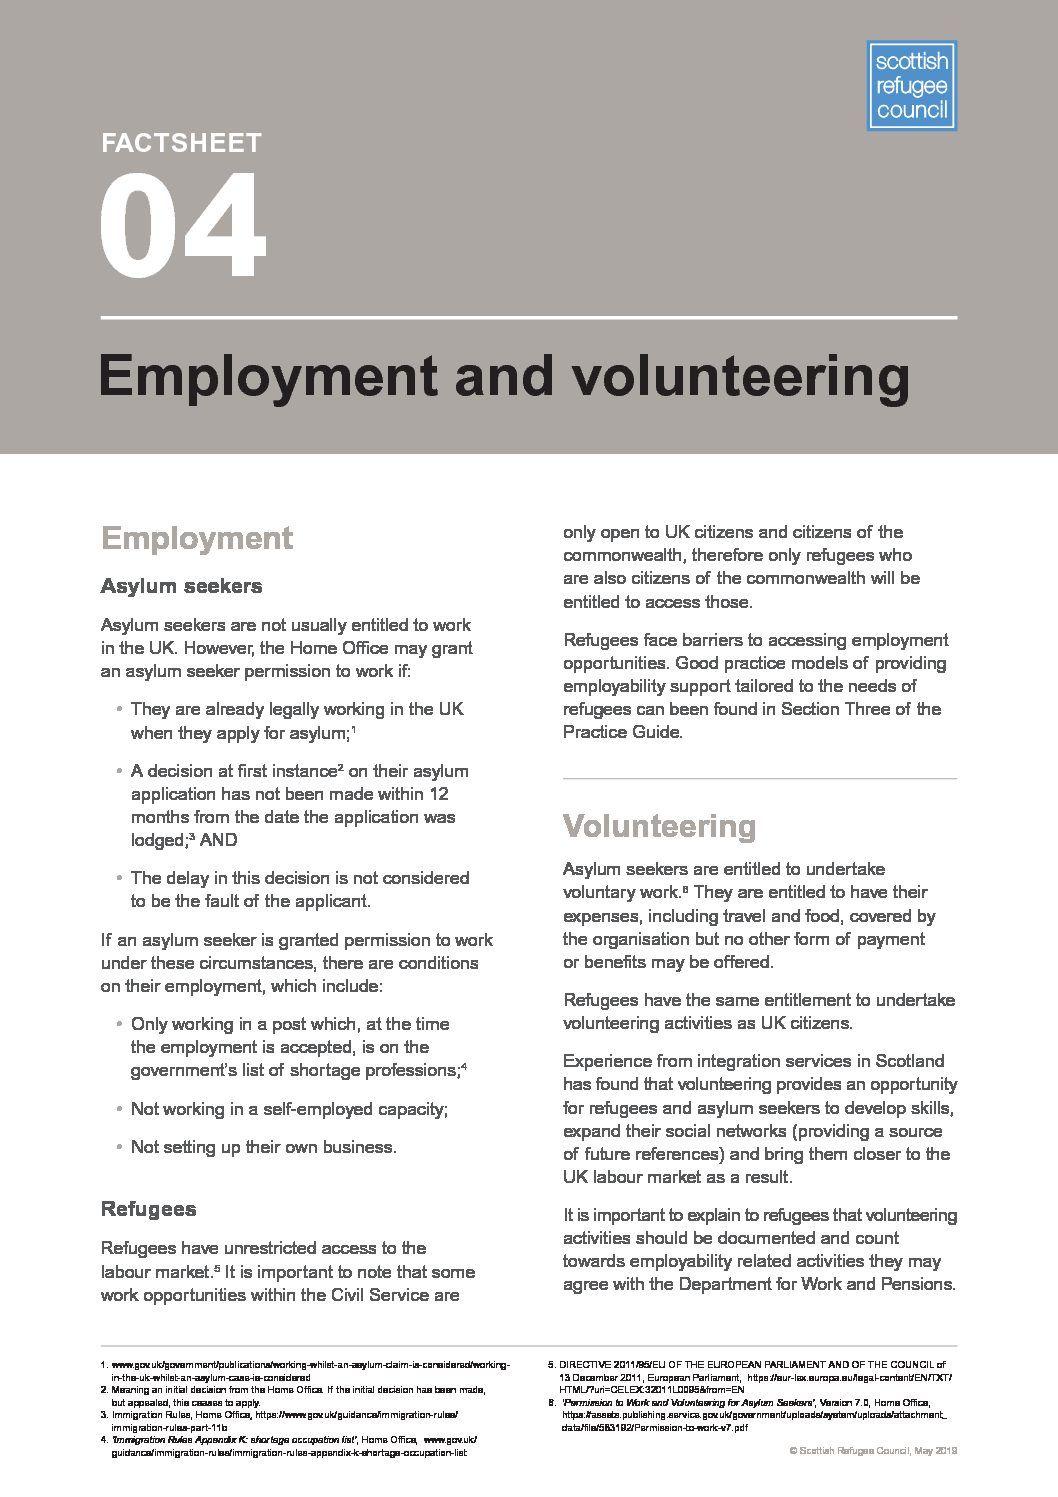 SRC_Factsheets_04-pdf